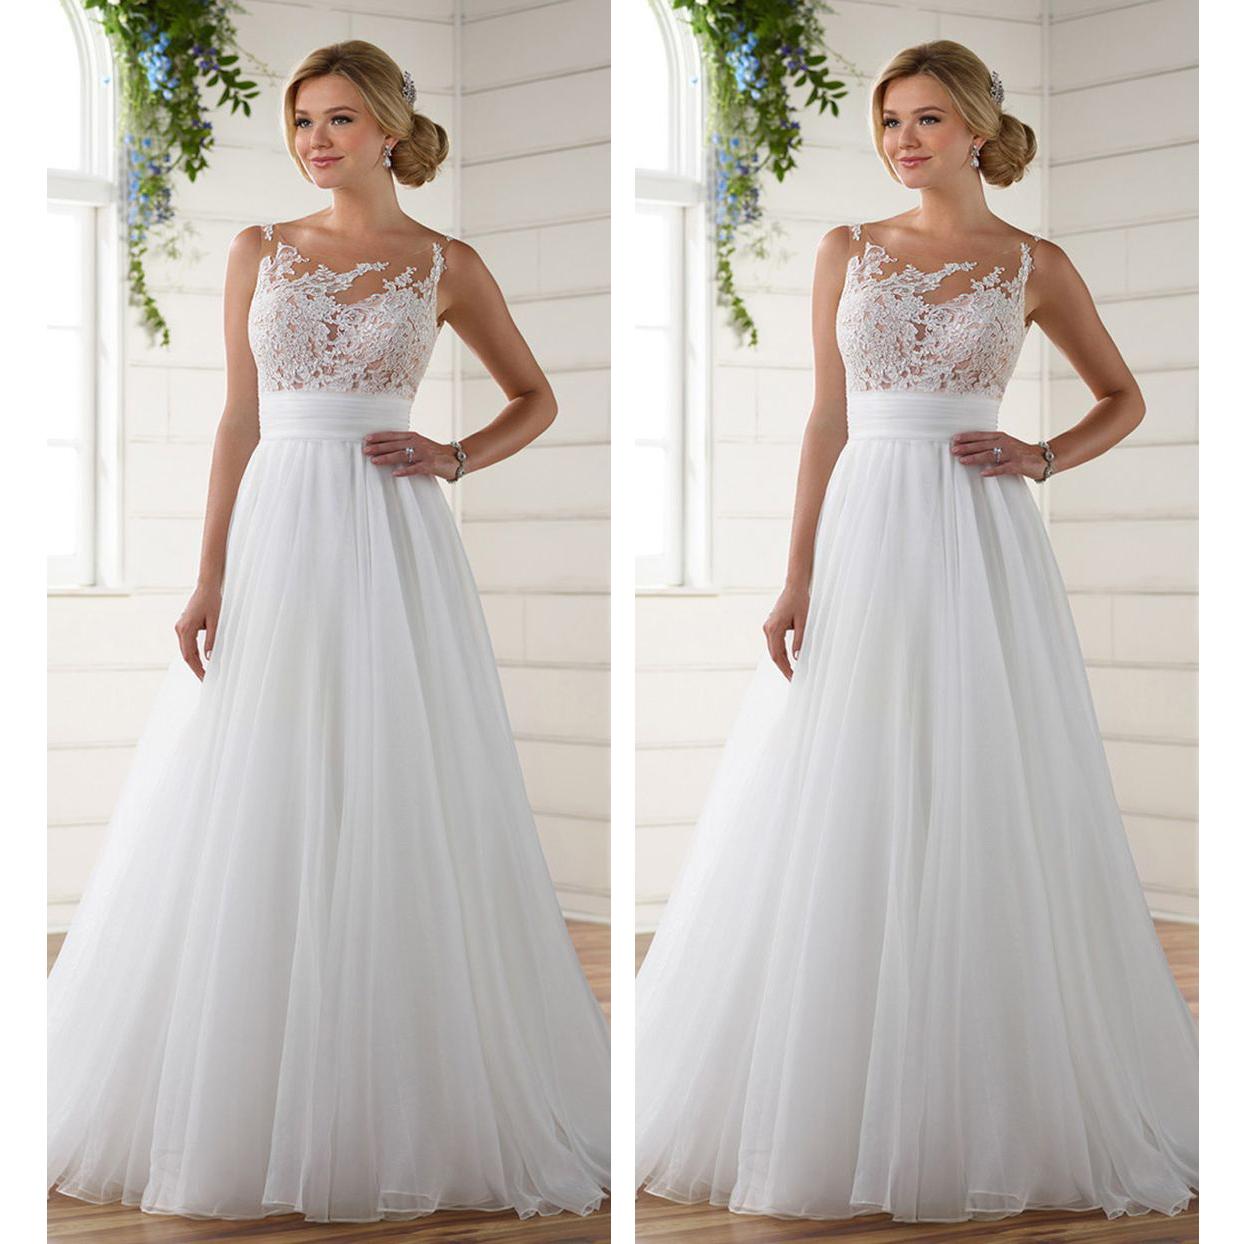 Wedding Gown Warehouse: 2018 Vintage Lace Wedding Dress Sheer Scoop Neck Chiffon